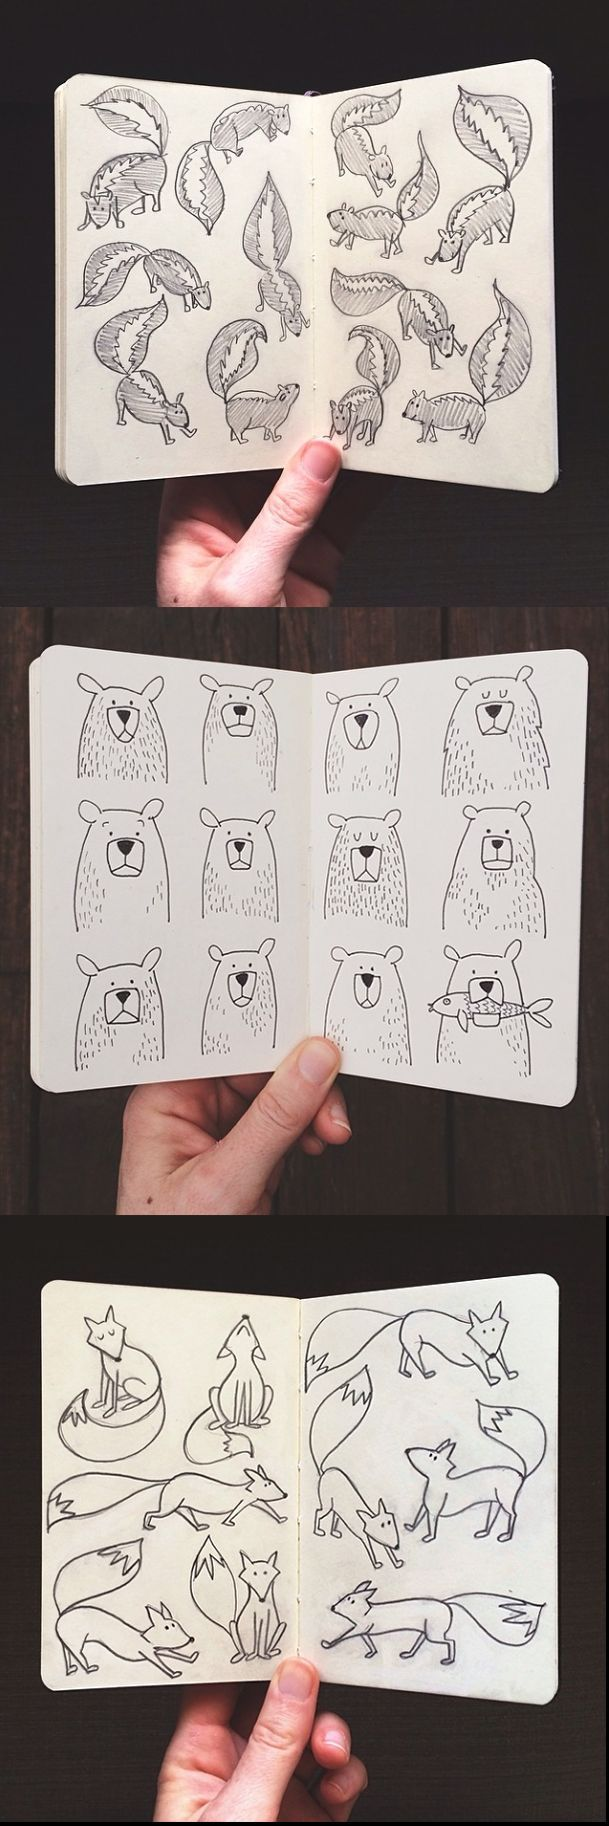 Illustration   1canoe2 - doodle inspiration - skunks, bears, foxes